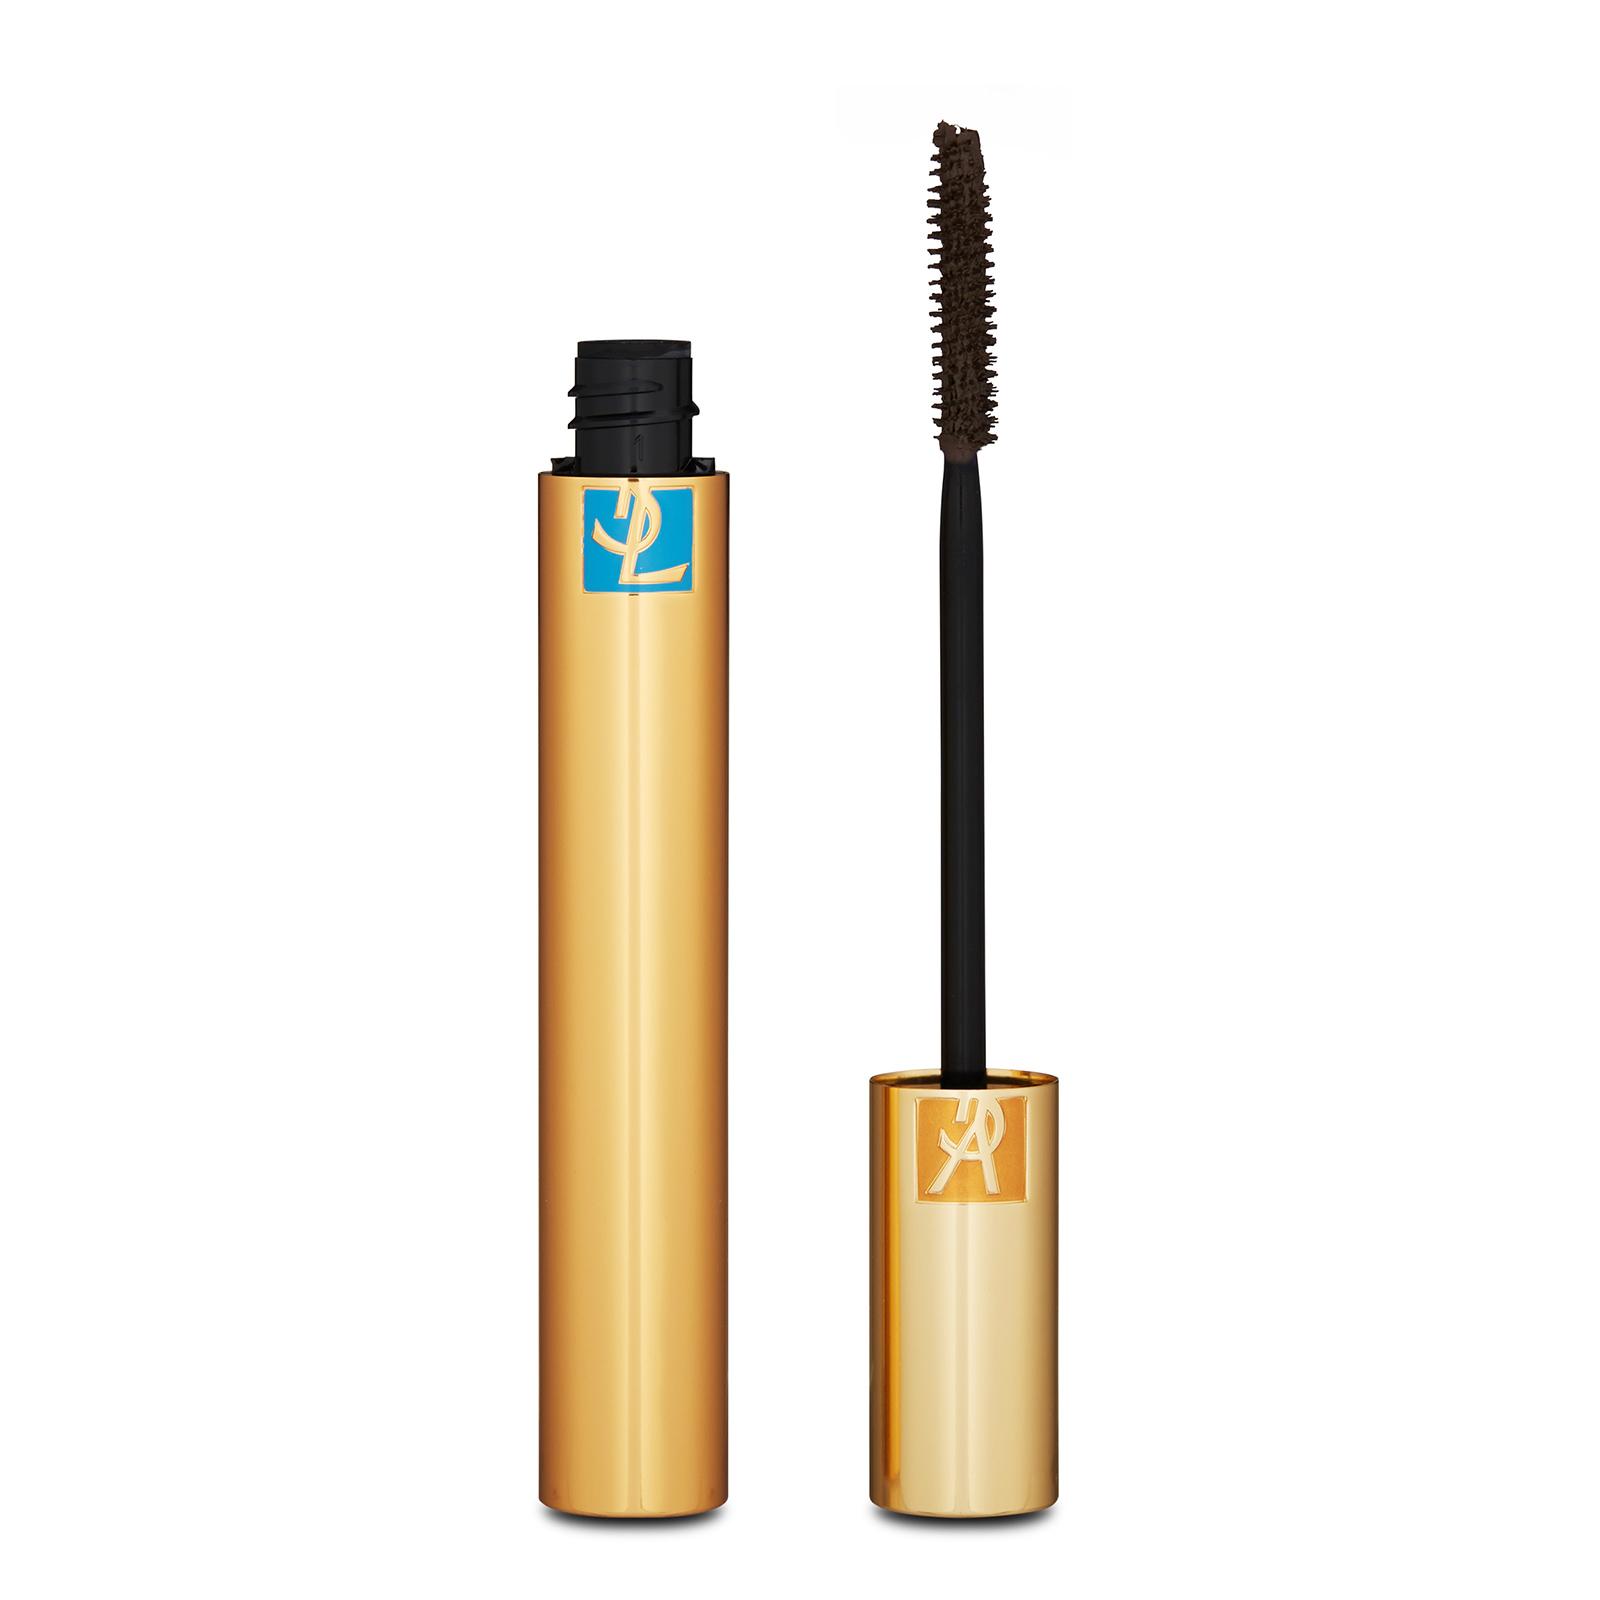 Yves Saint Laurent Mascara Volume Effect Faux Cils Luxurious Mascara Waterproof Burnt Brown, 0.23oz, 6.9ml